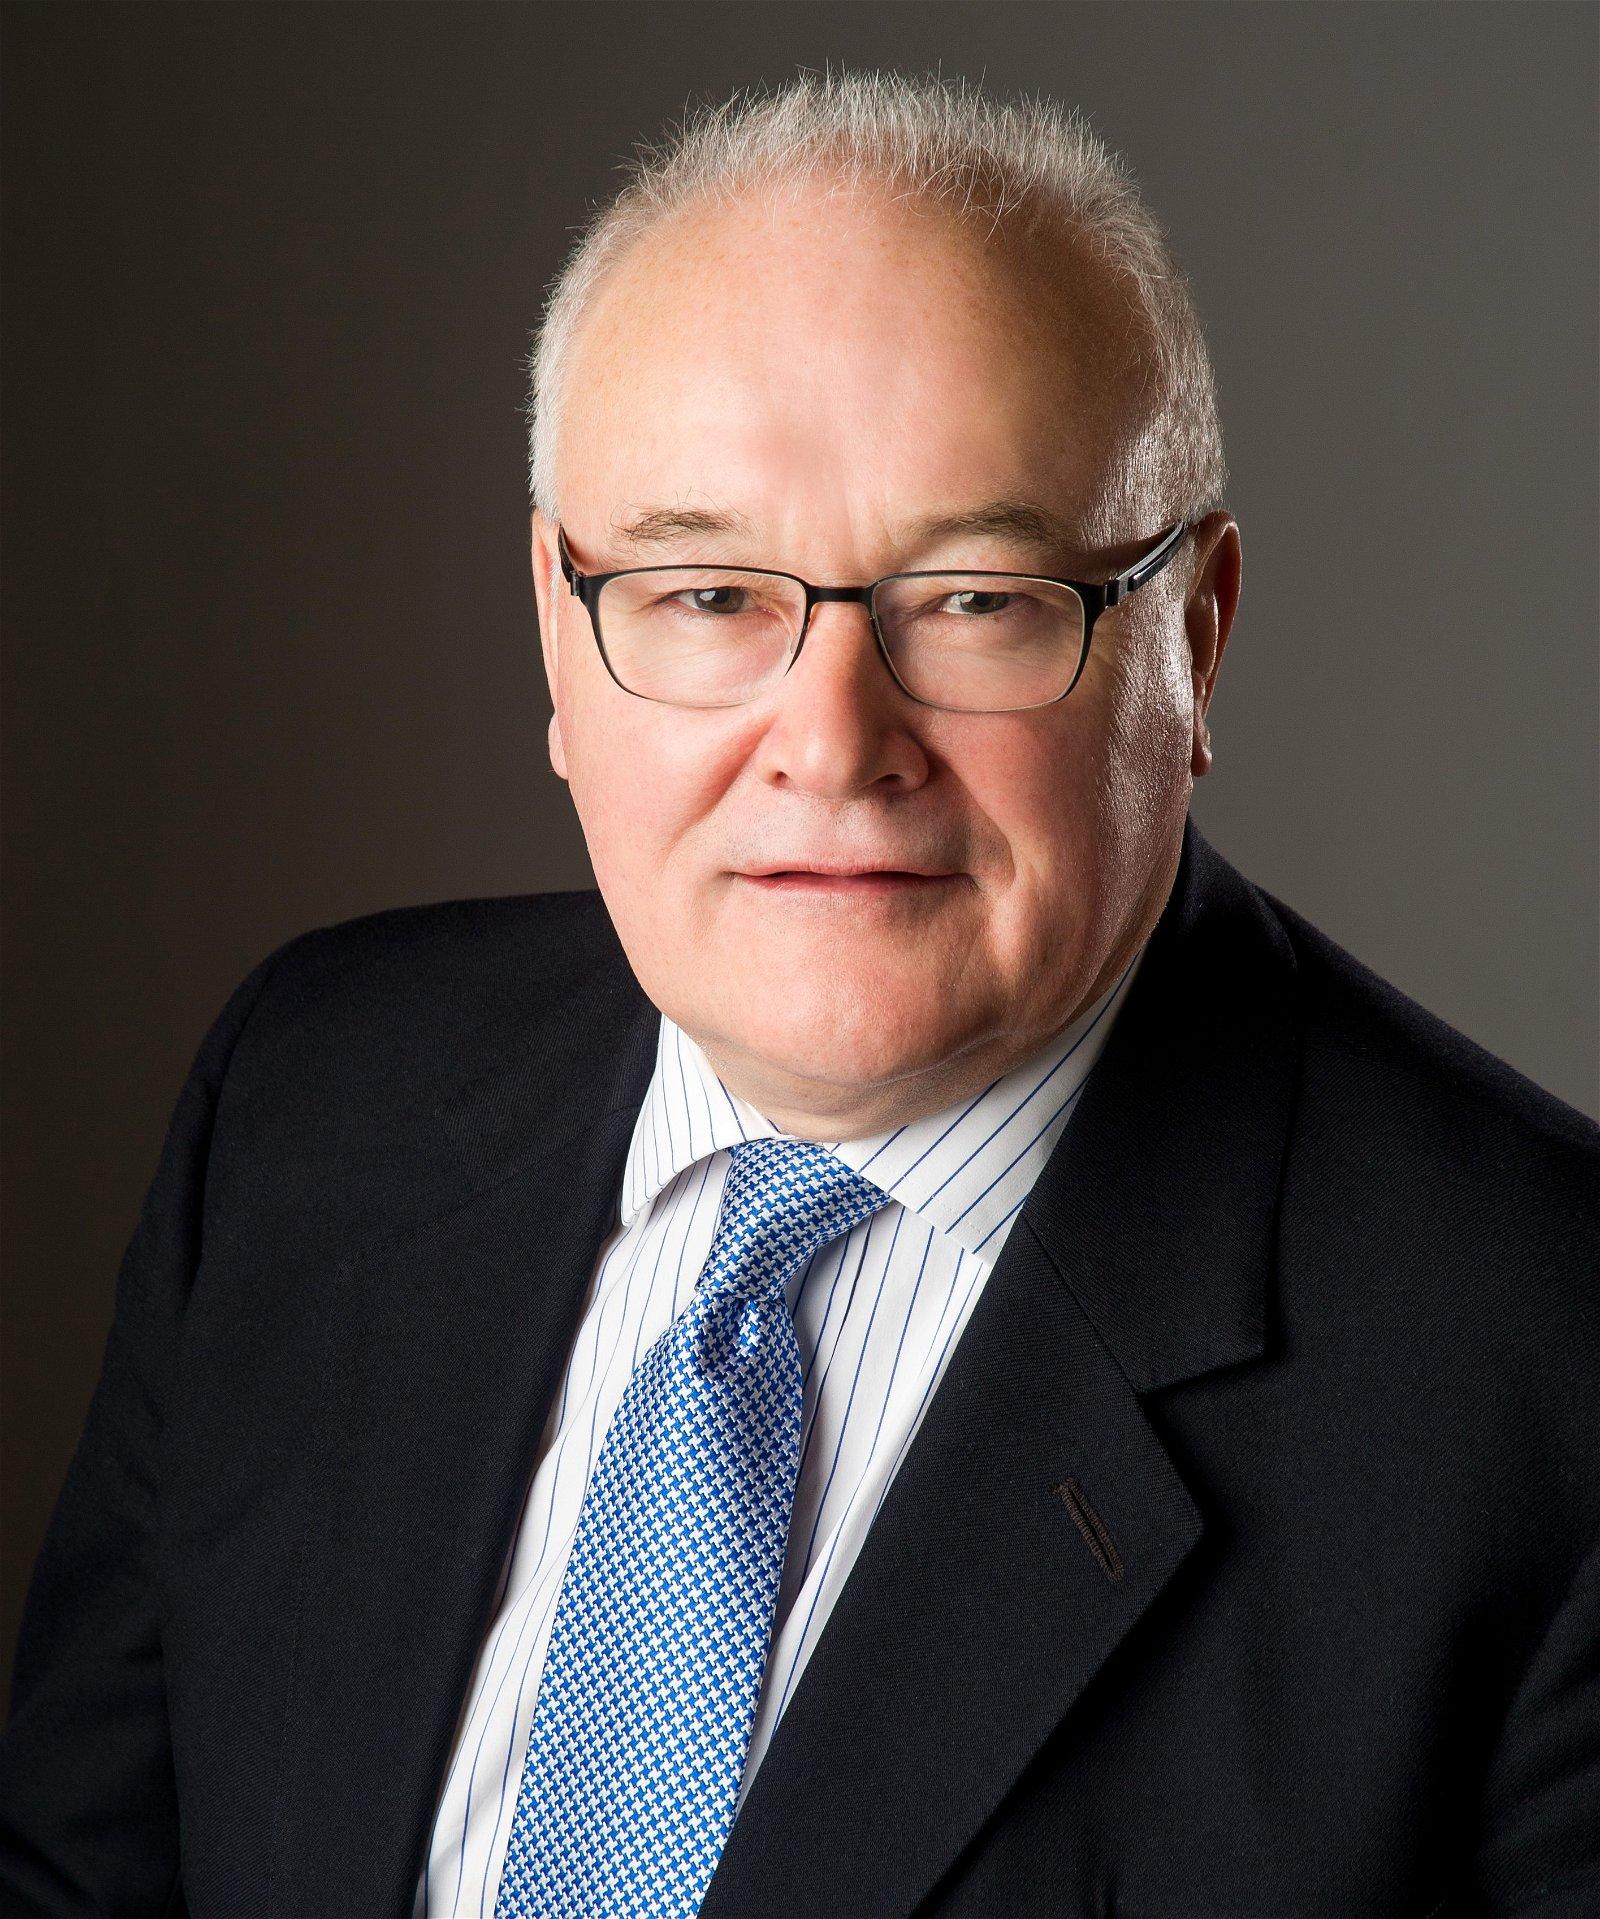 Sir Peter Wall